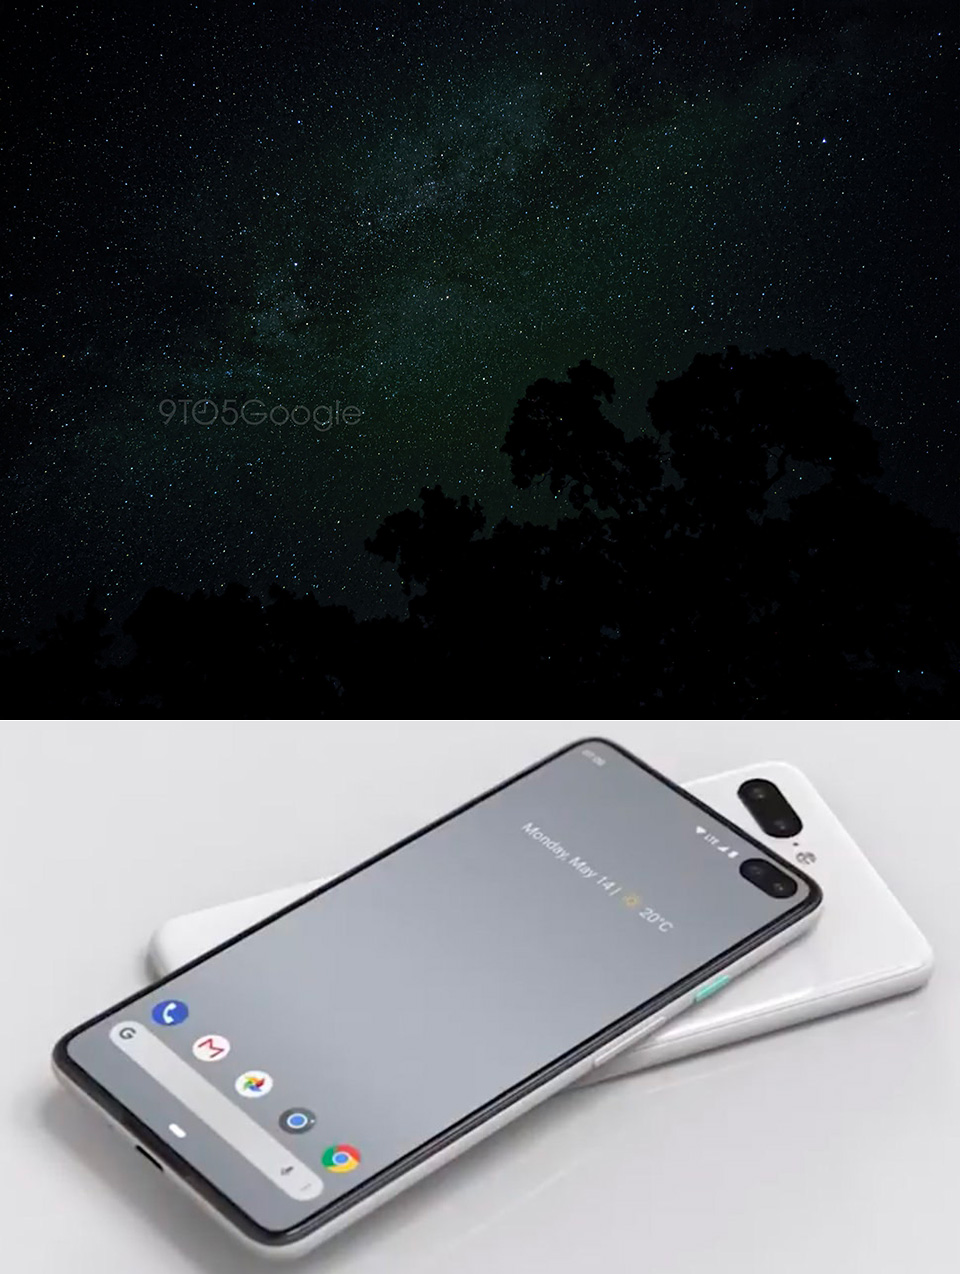 Google Pixel 4 Astrophotography